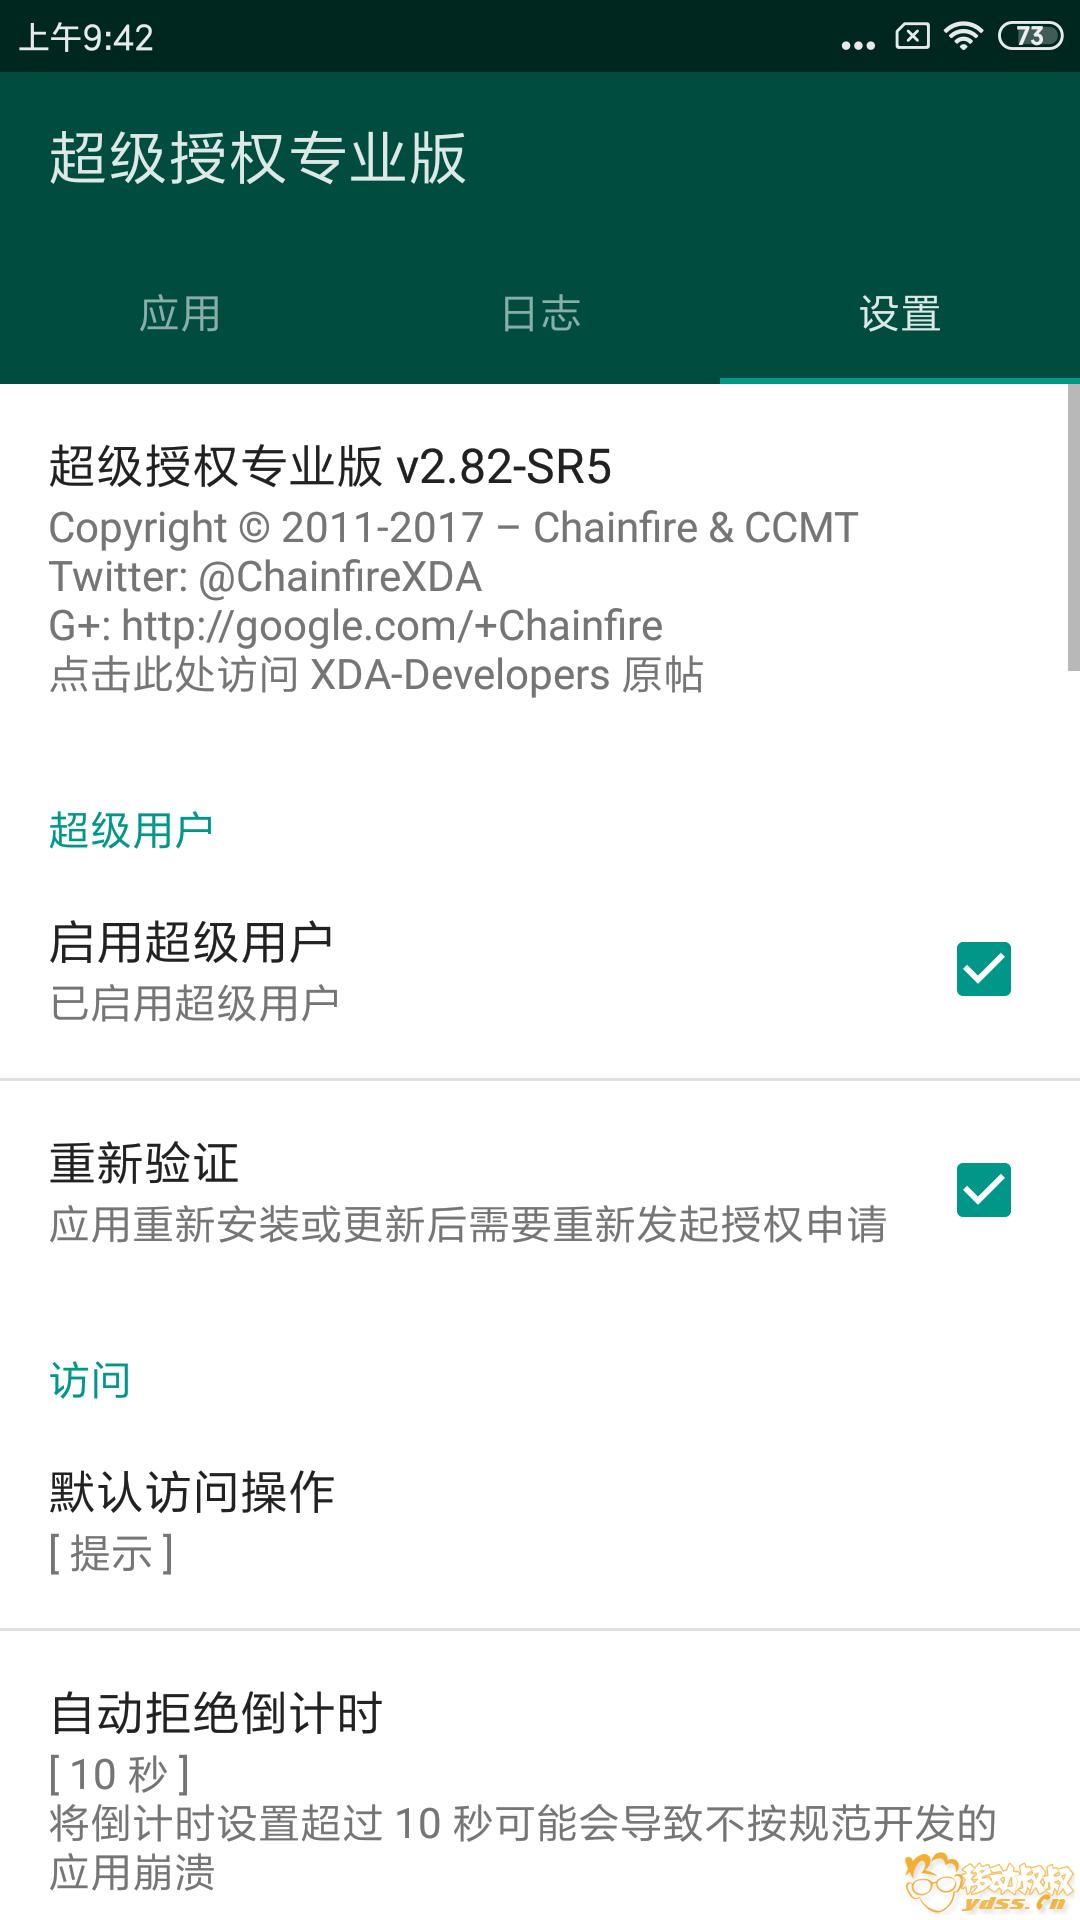 Screenshot_2018-12-01-09-42-10-905_eu.chainfire.supersu.png